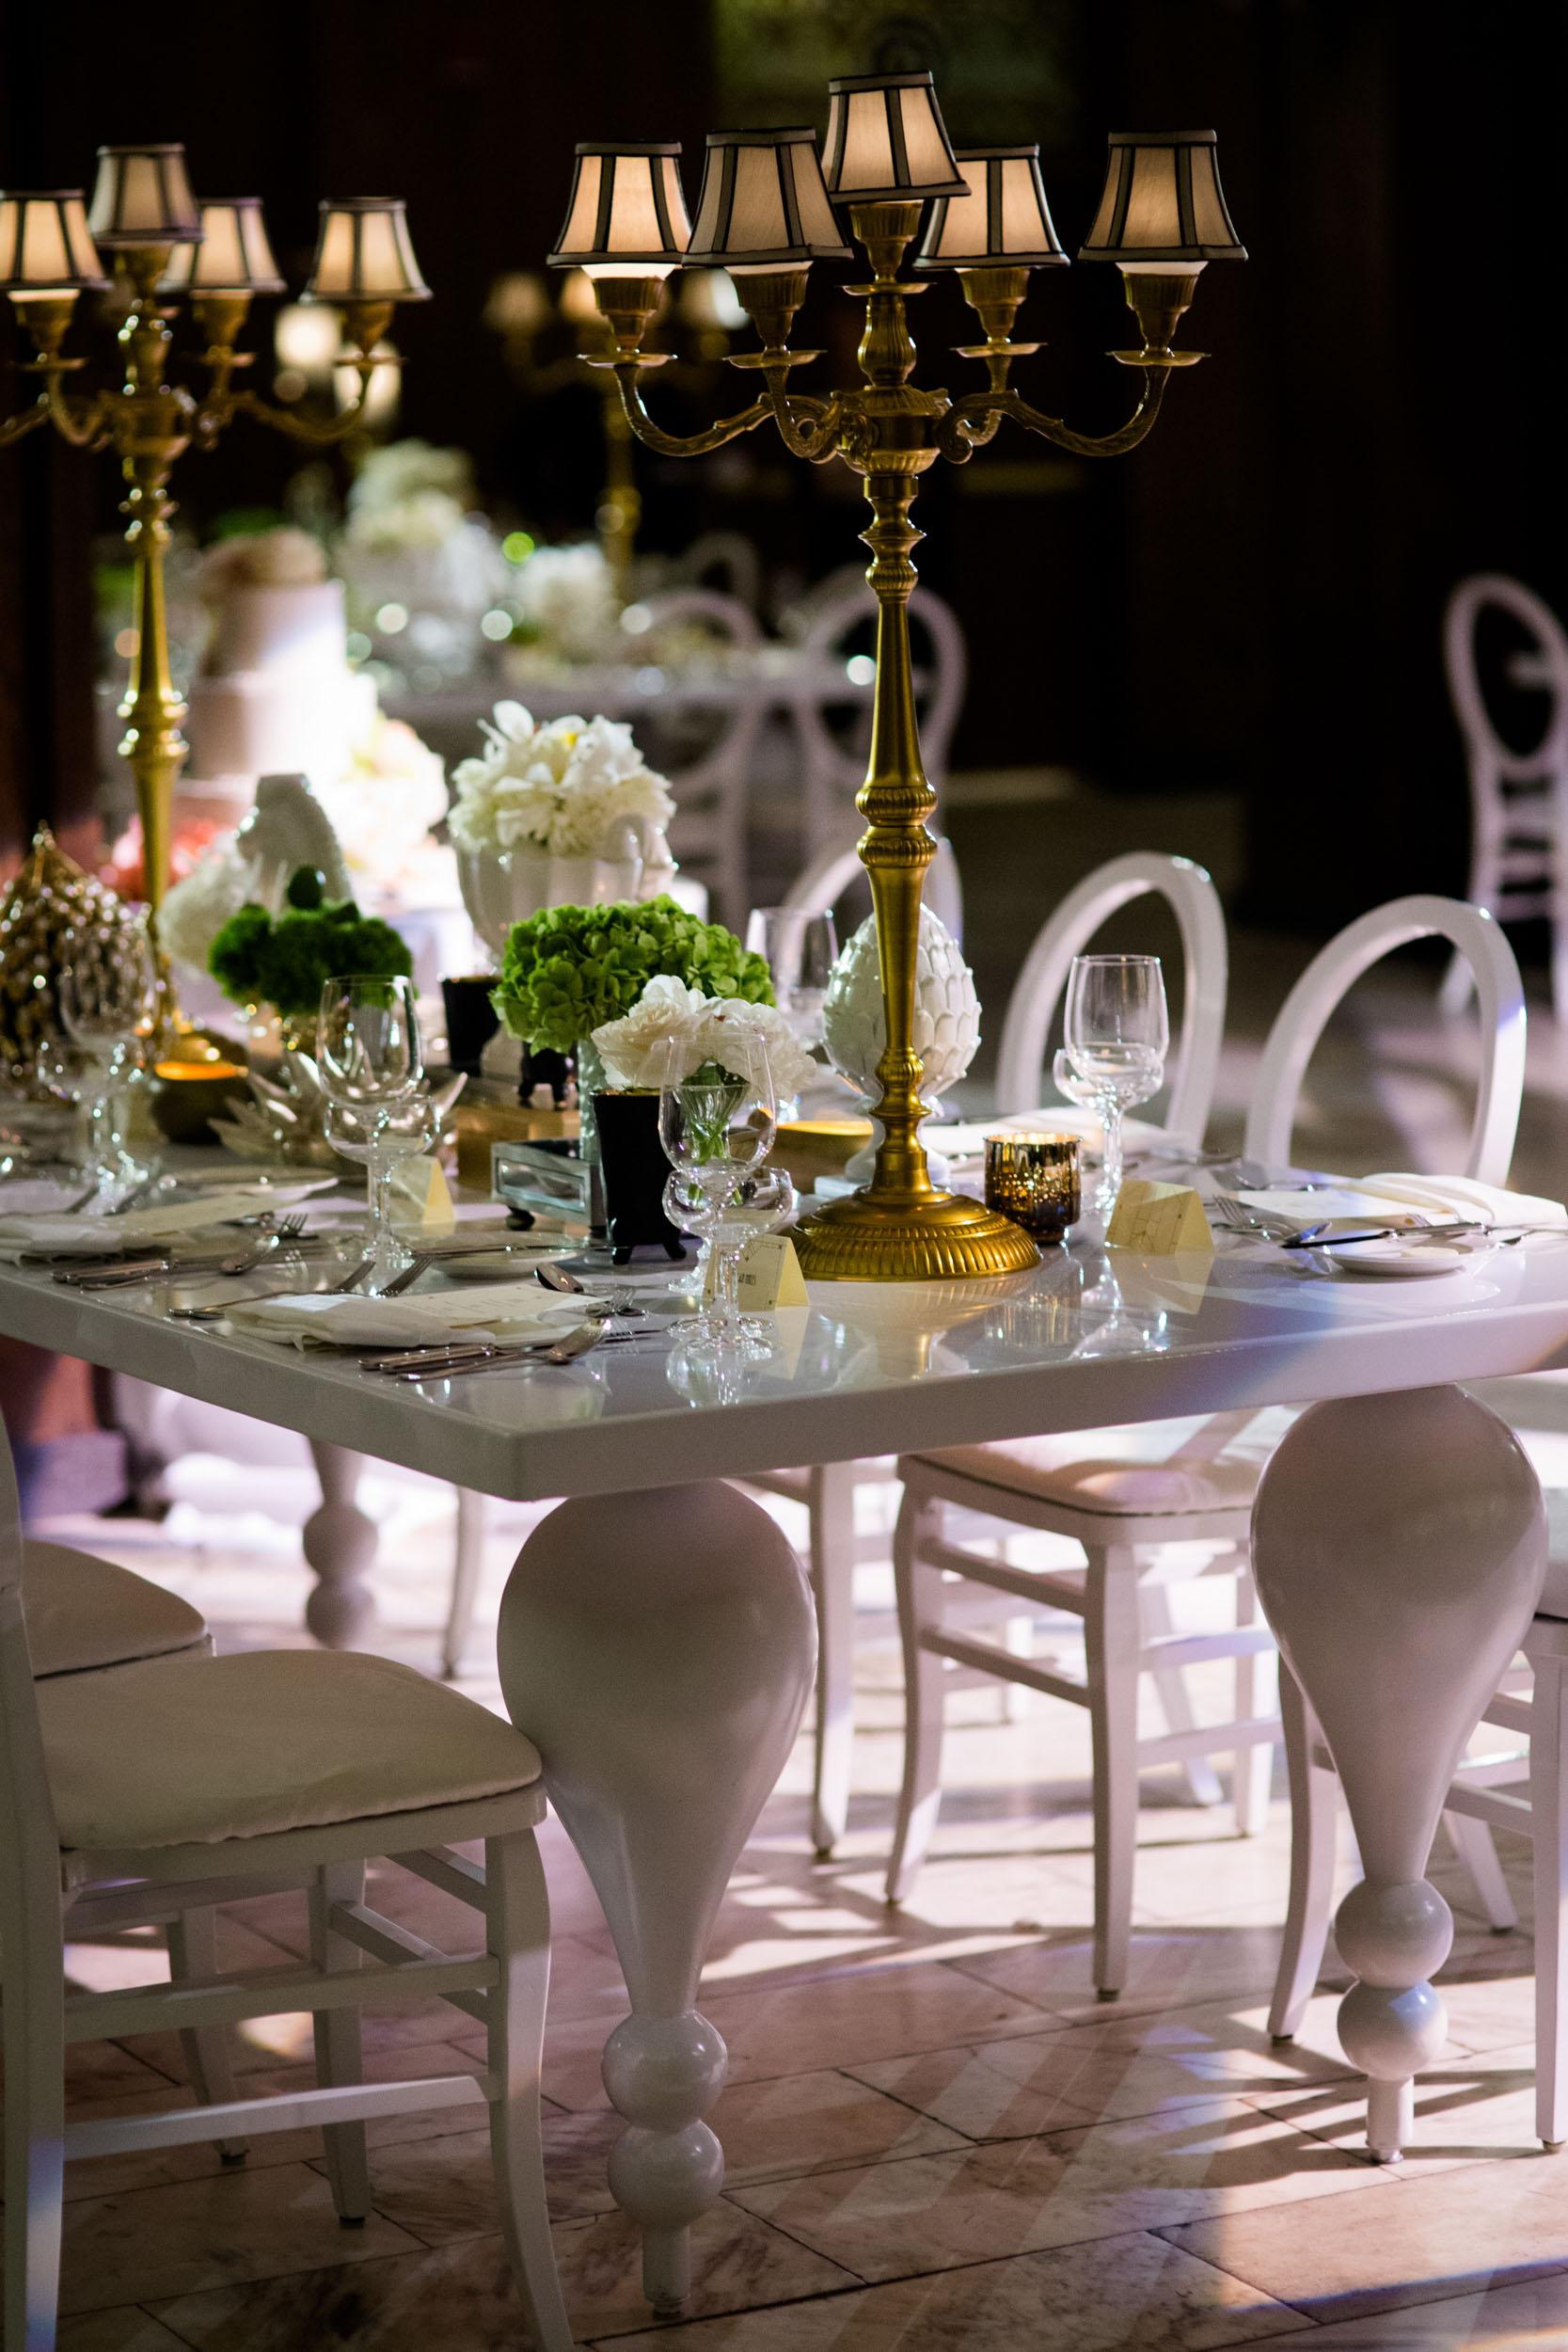 Southern elegant wedding reception at Chicago Athletic Association - White City Ballroom